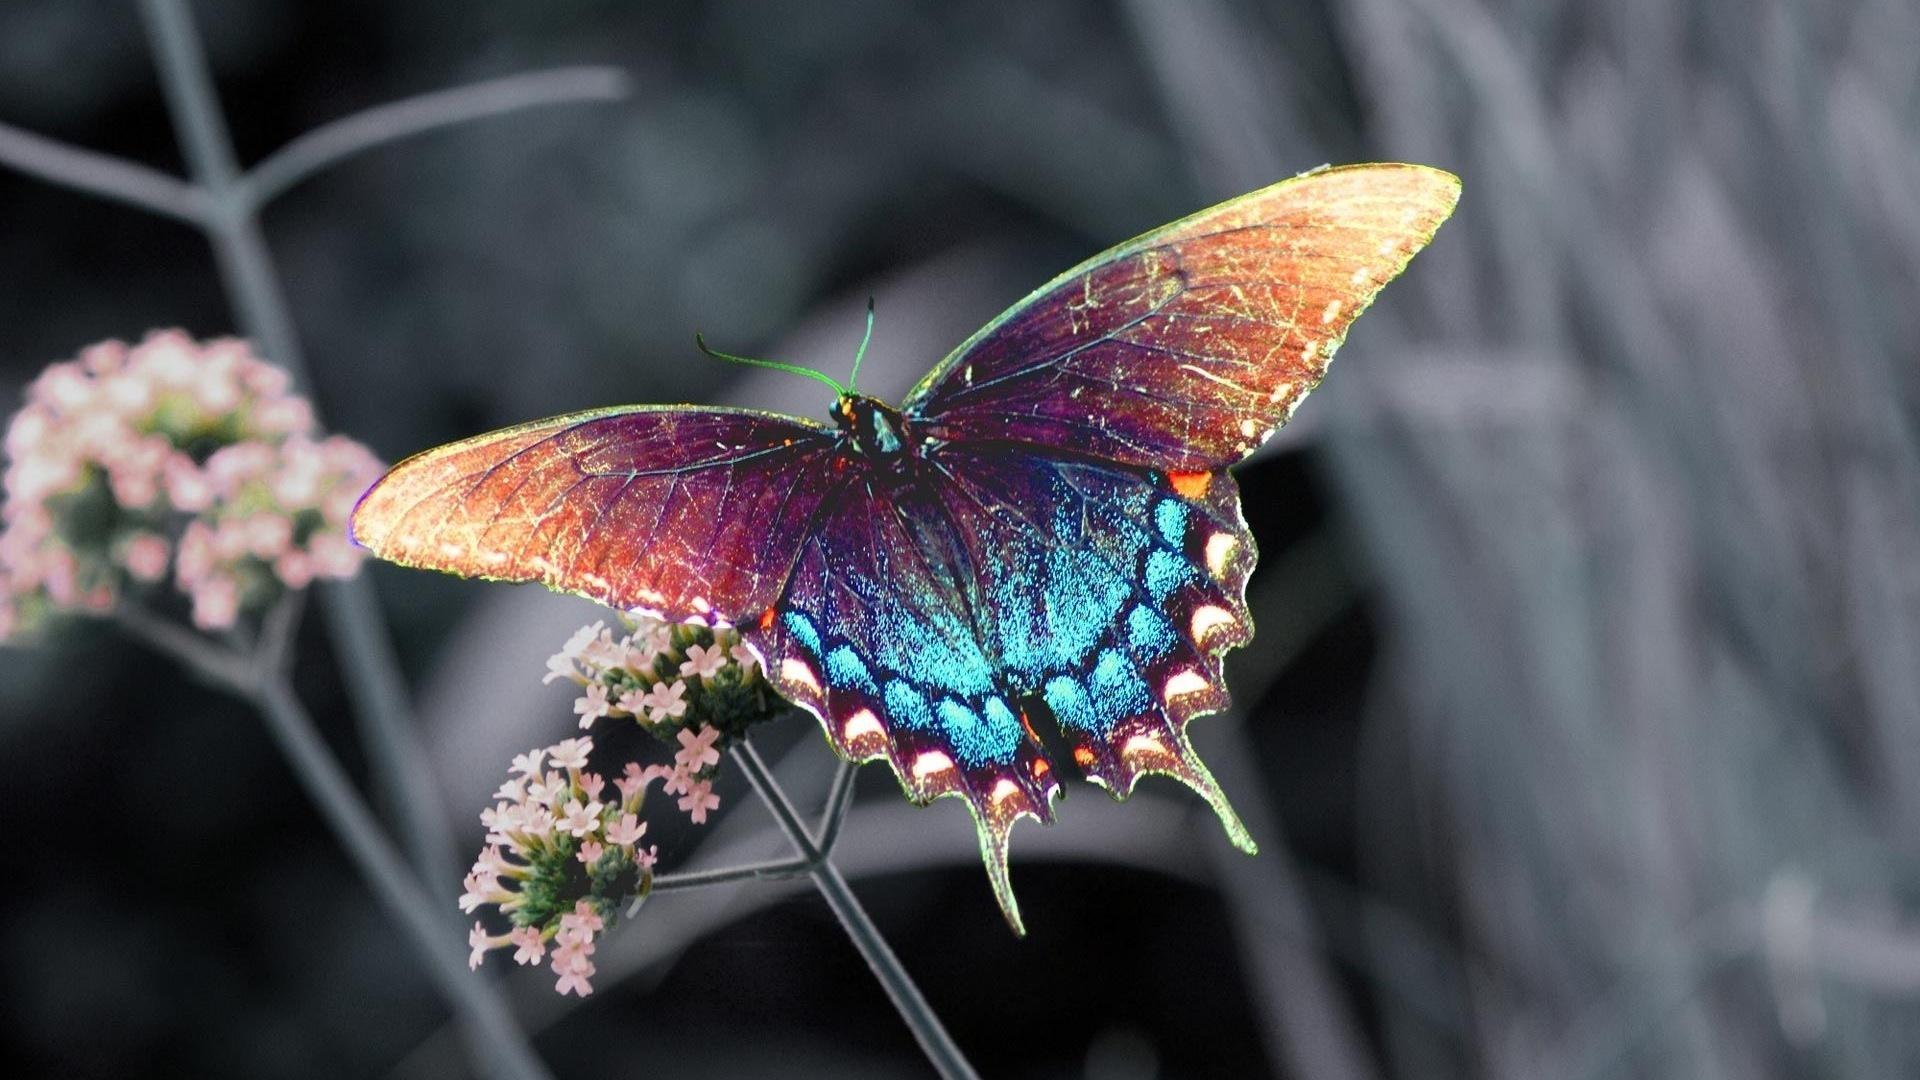 Wallpaper Beautiful Colorful Butterfly 1920x1080 Full HD